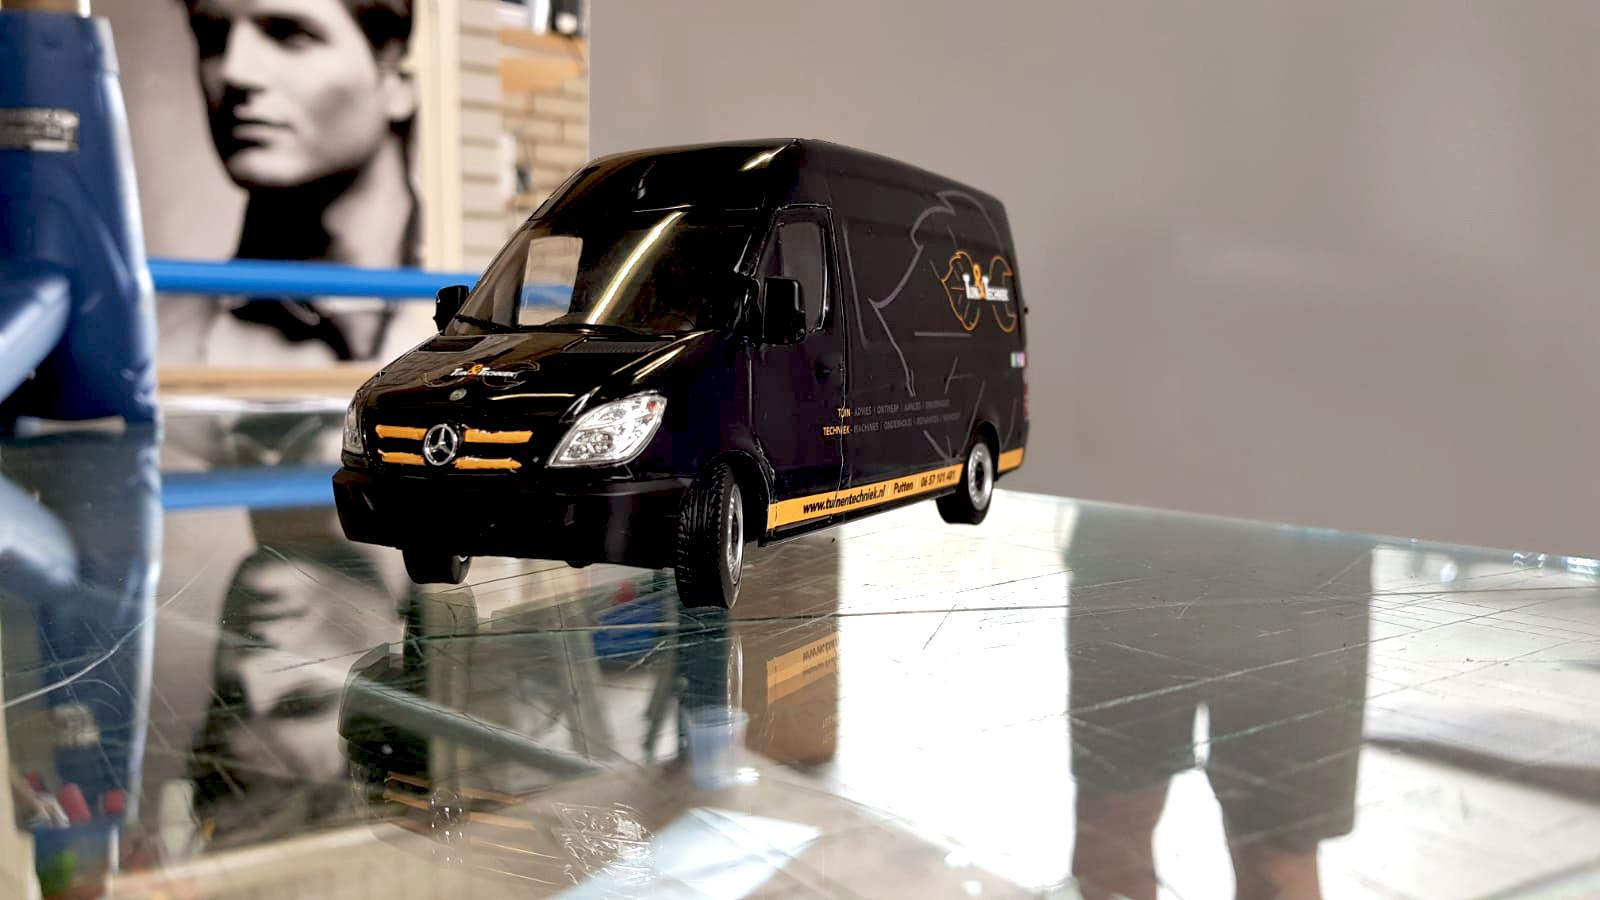 Mini autobelettering